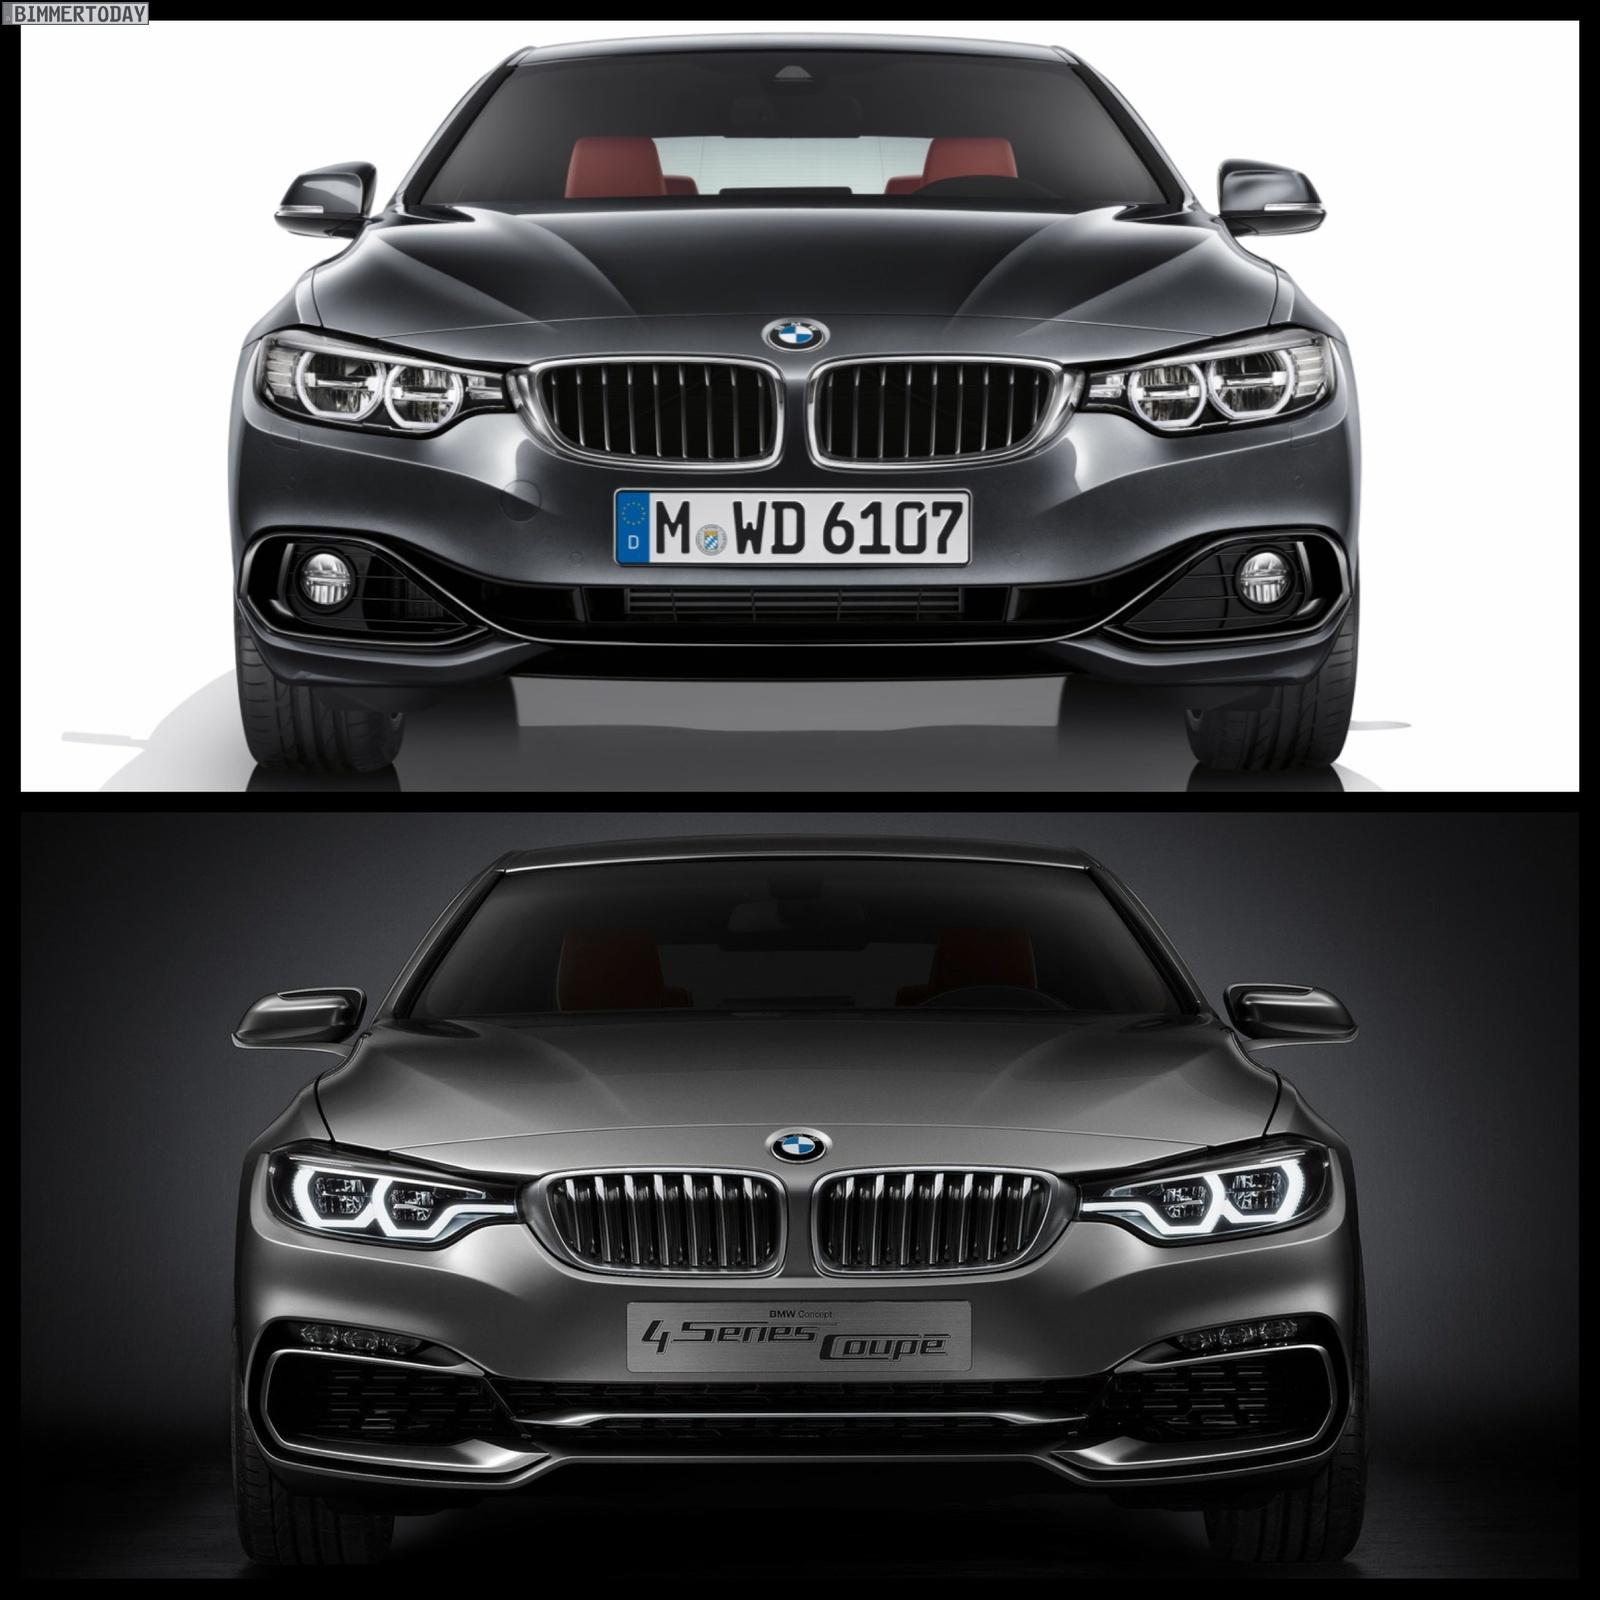 BMW Concept 4 Series Vs. BMW 4 Series Coupe Production